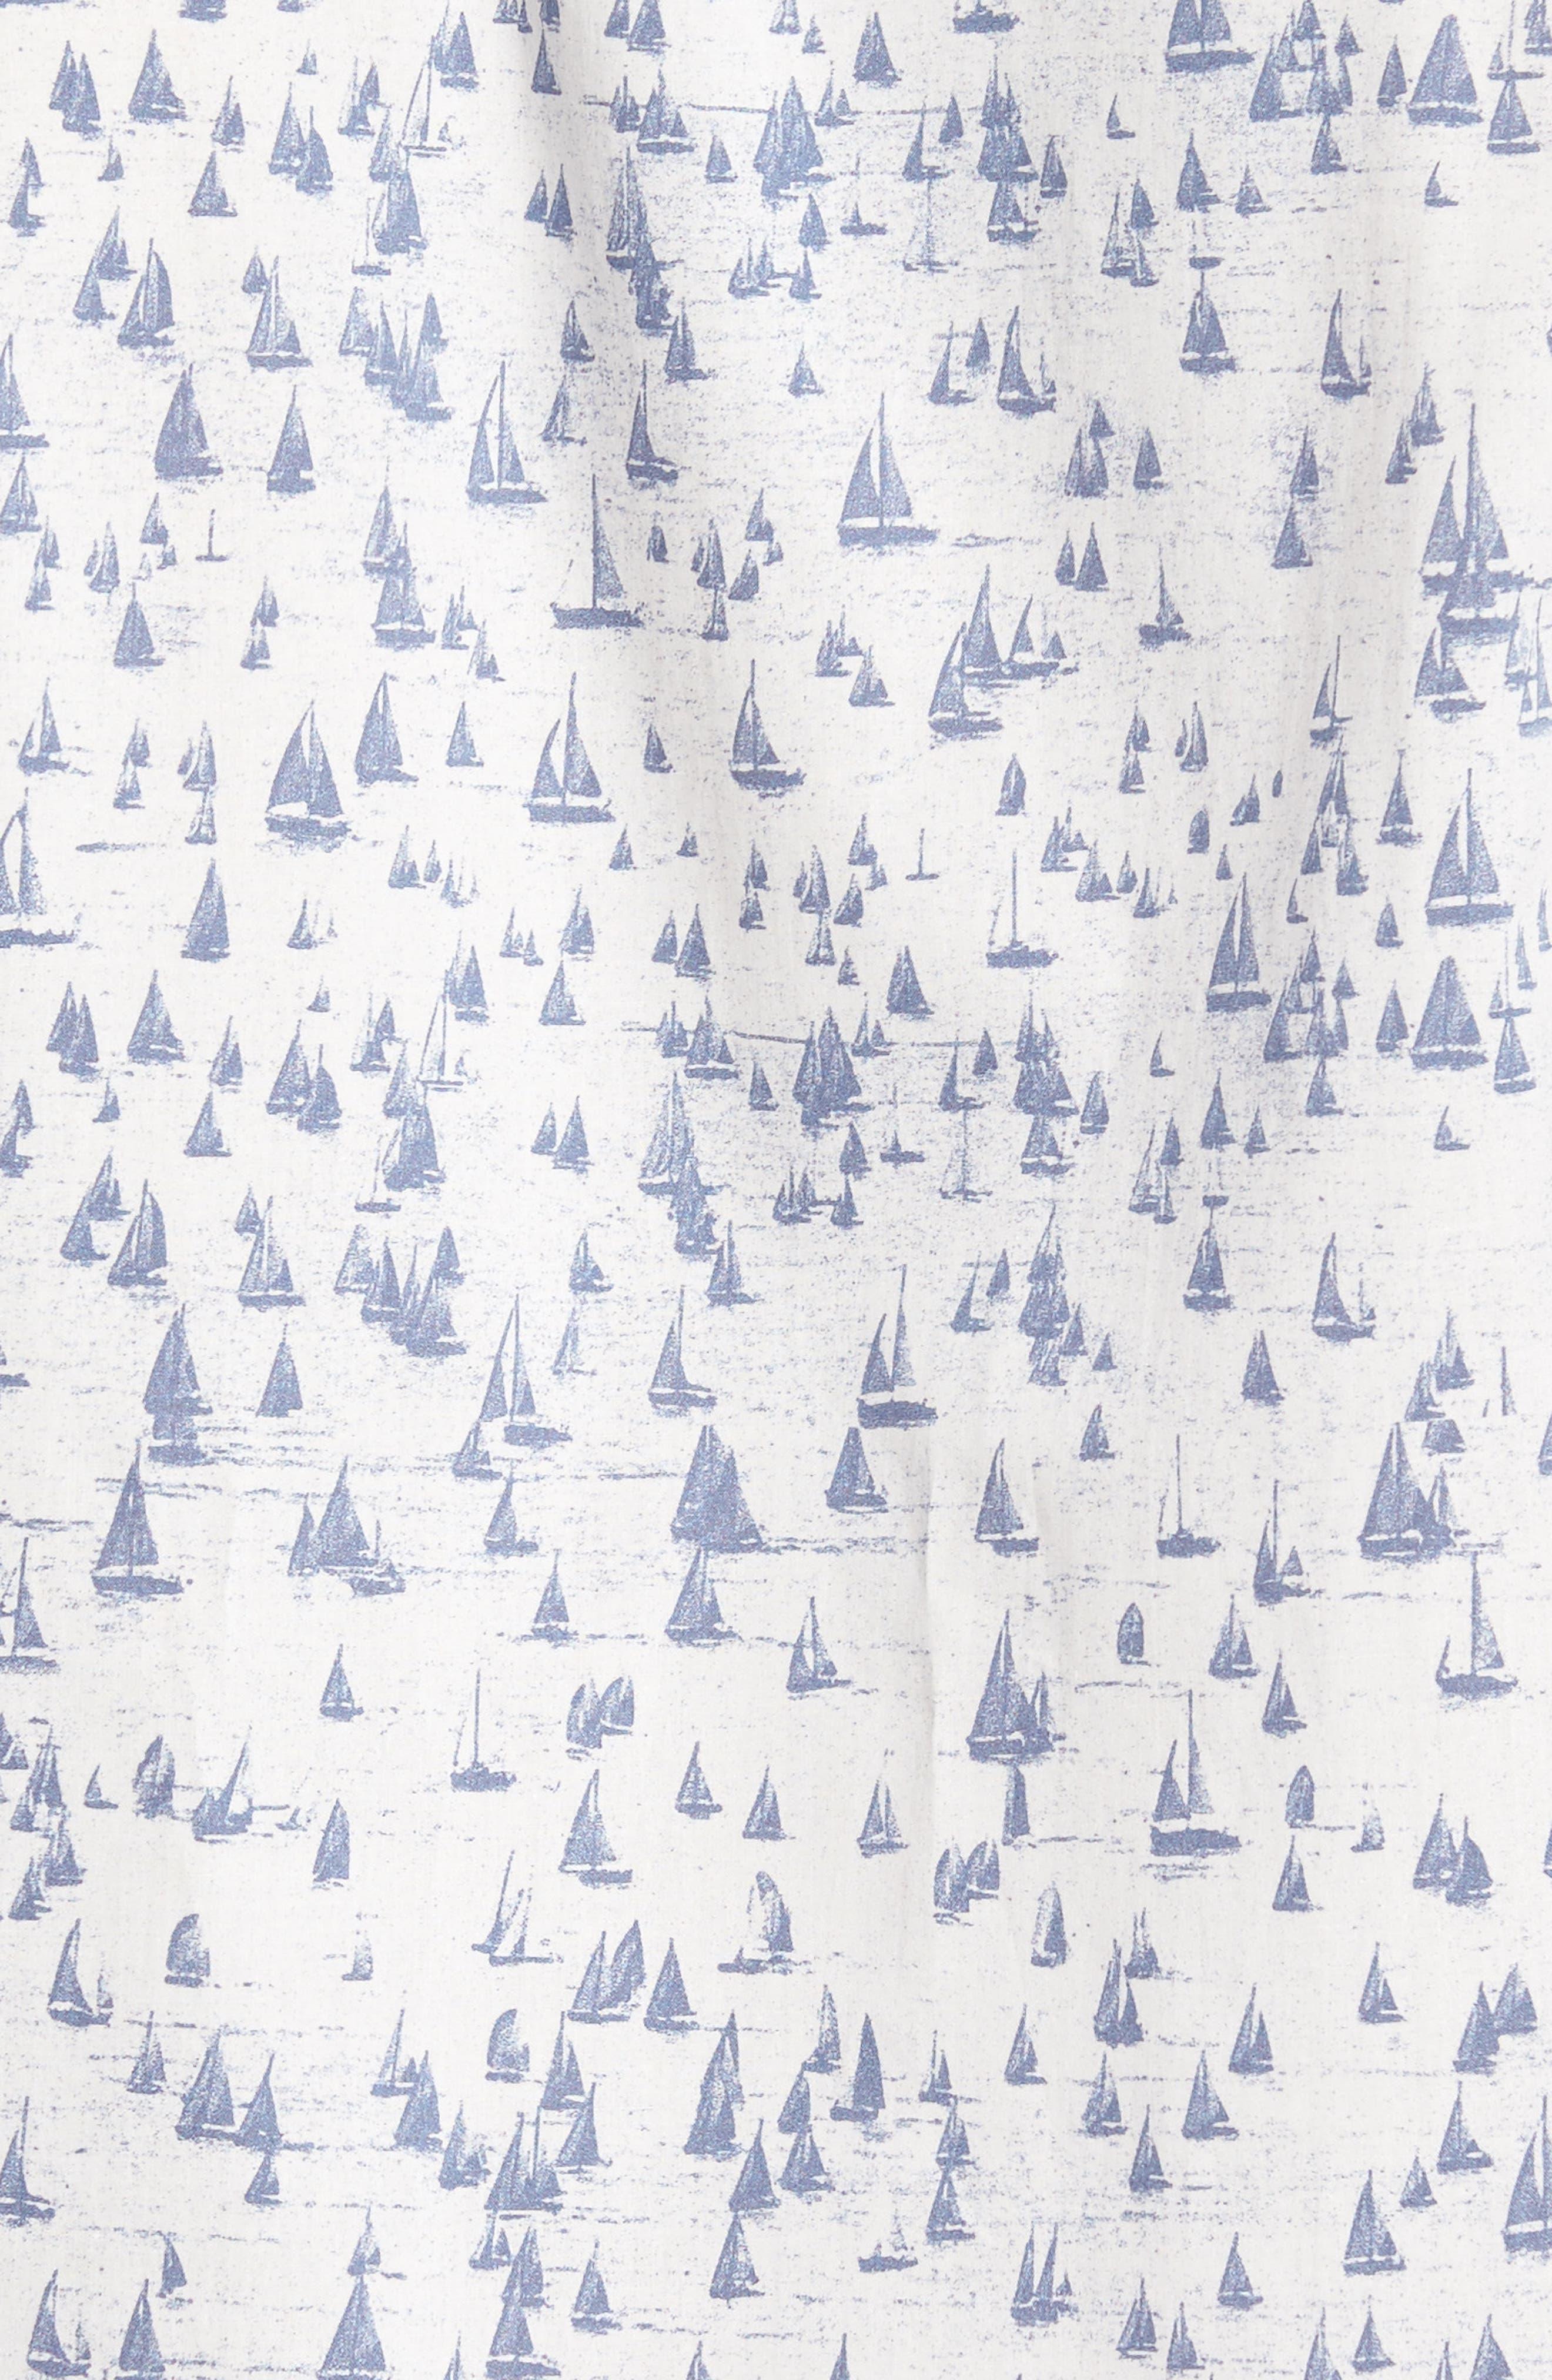 Smooth Sailin' Print Woven Shirt,                             Alternate thumbnail 5, color,                             Avio Blue